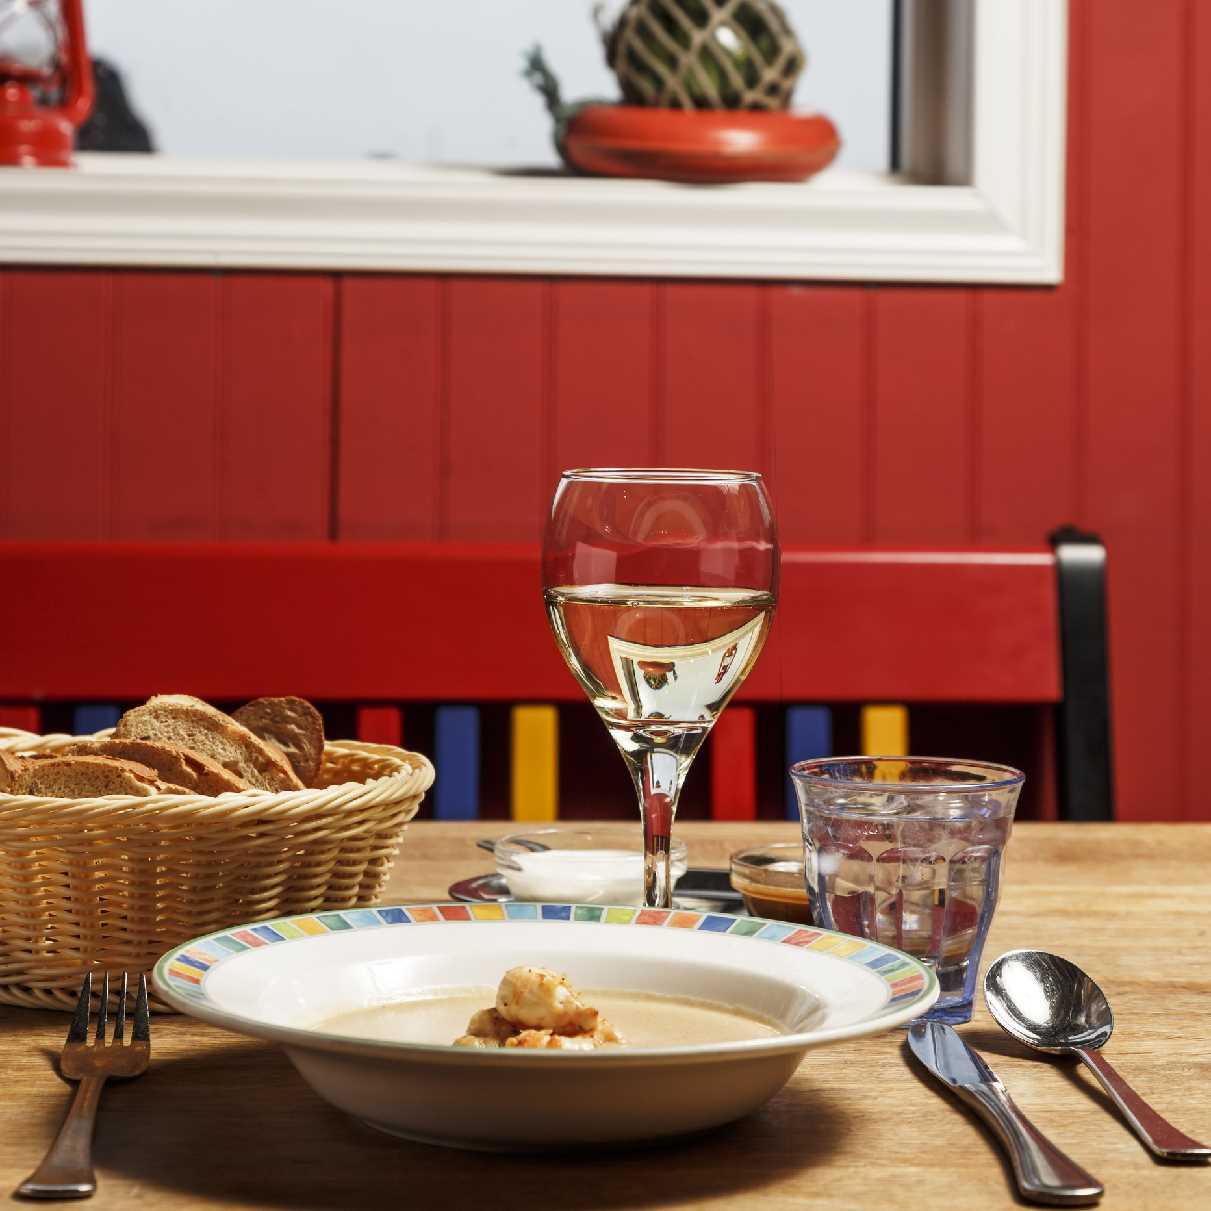 Lobster-Dinner-Iceland